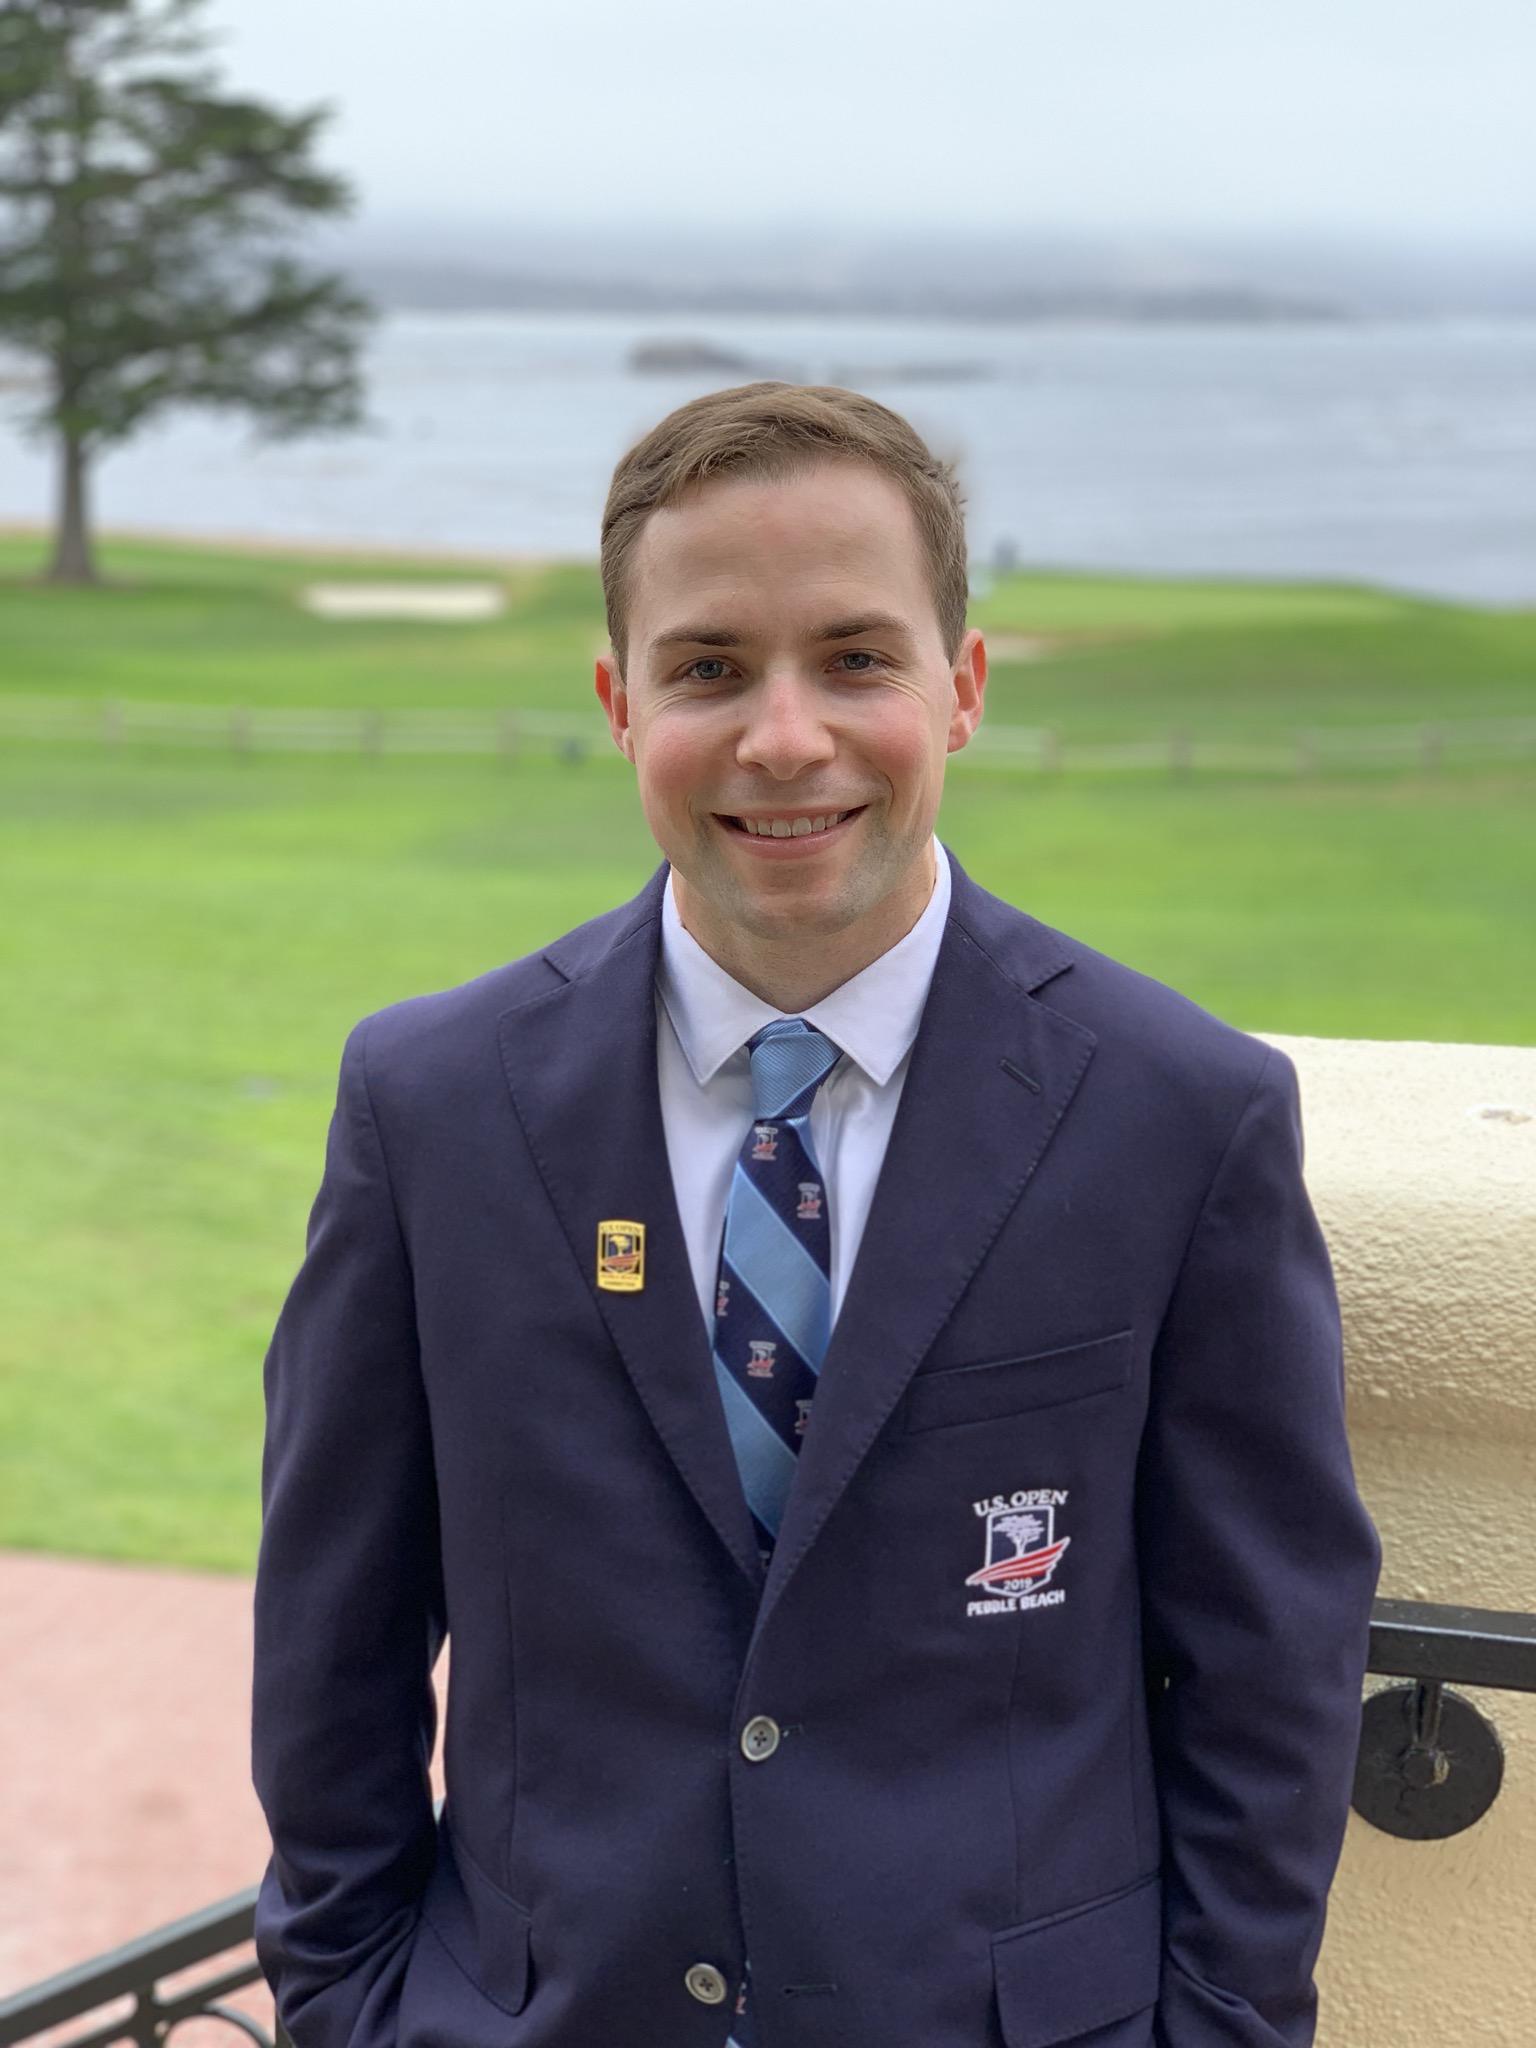 PGA of America Names Nicholas Heyrman Championship Coordinator for PGA WORKS Collegiate Championship